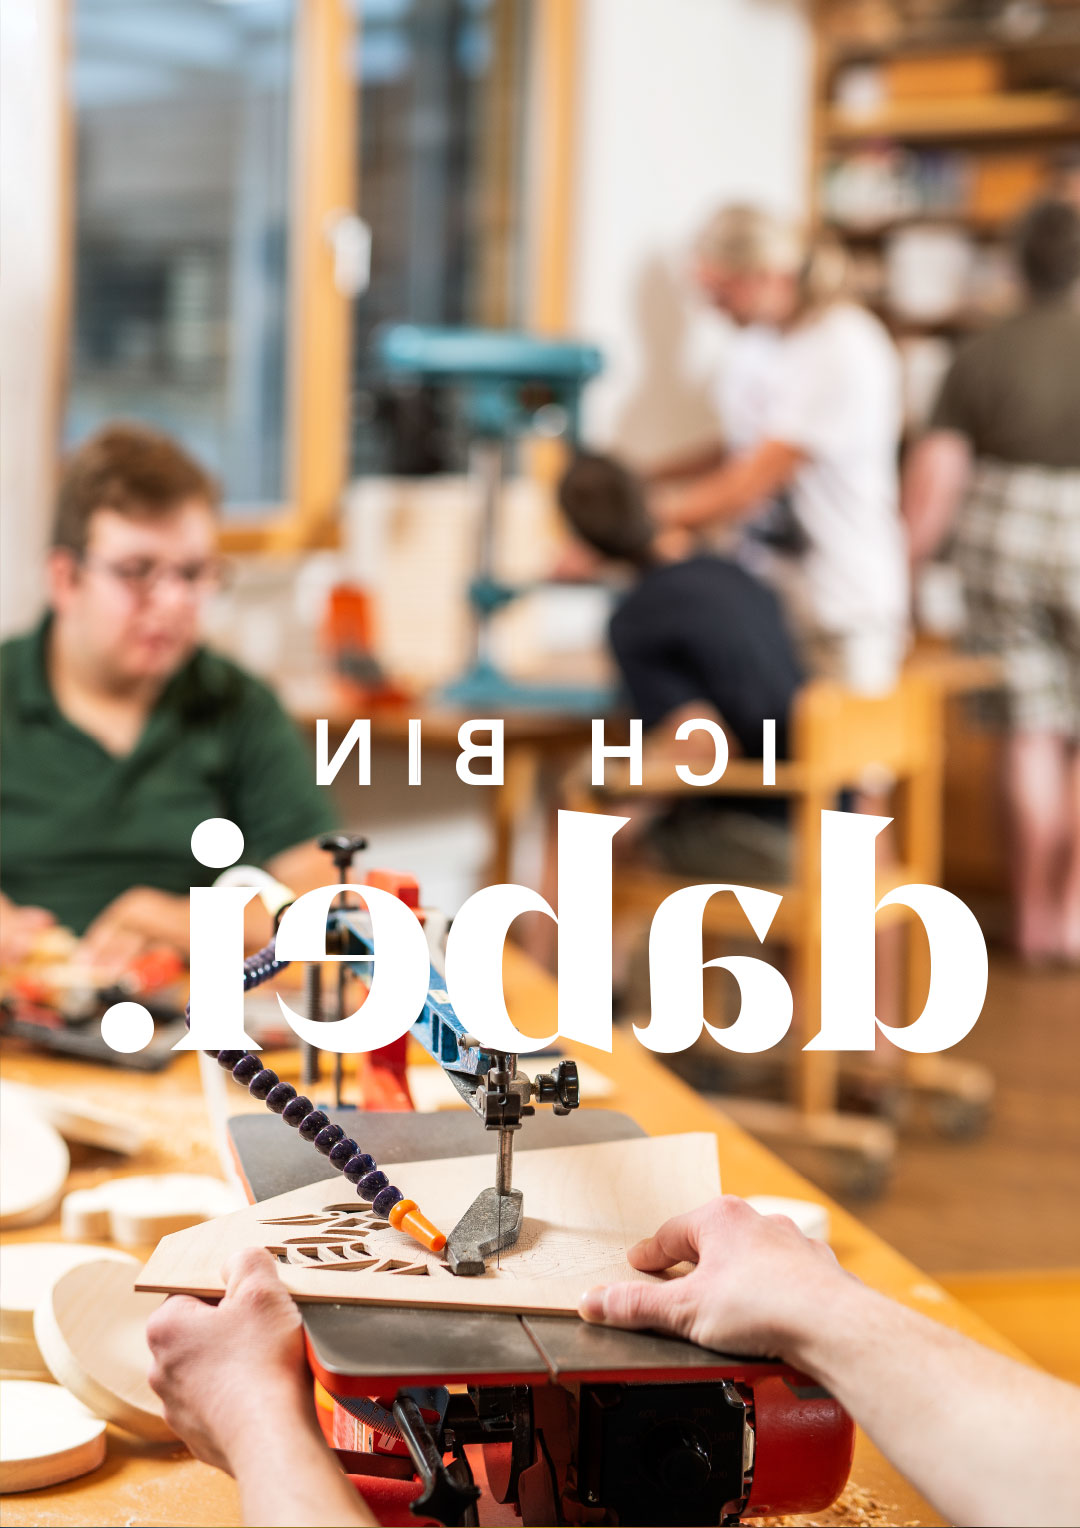 djw-lebenshilfe-hoch-sujet-werkstatt-teaser